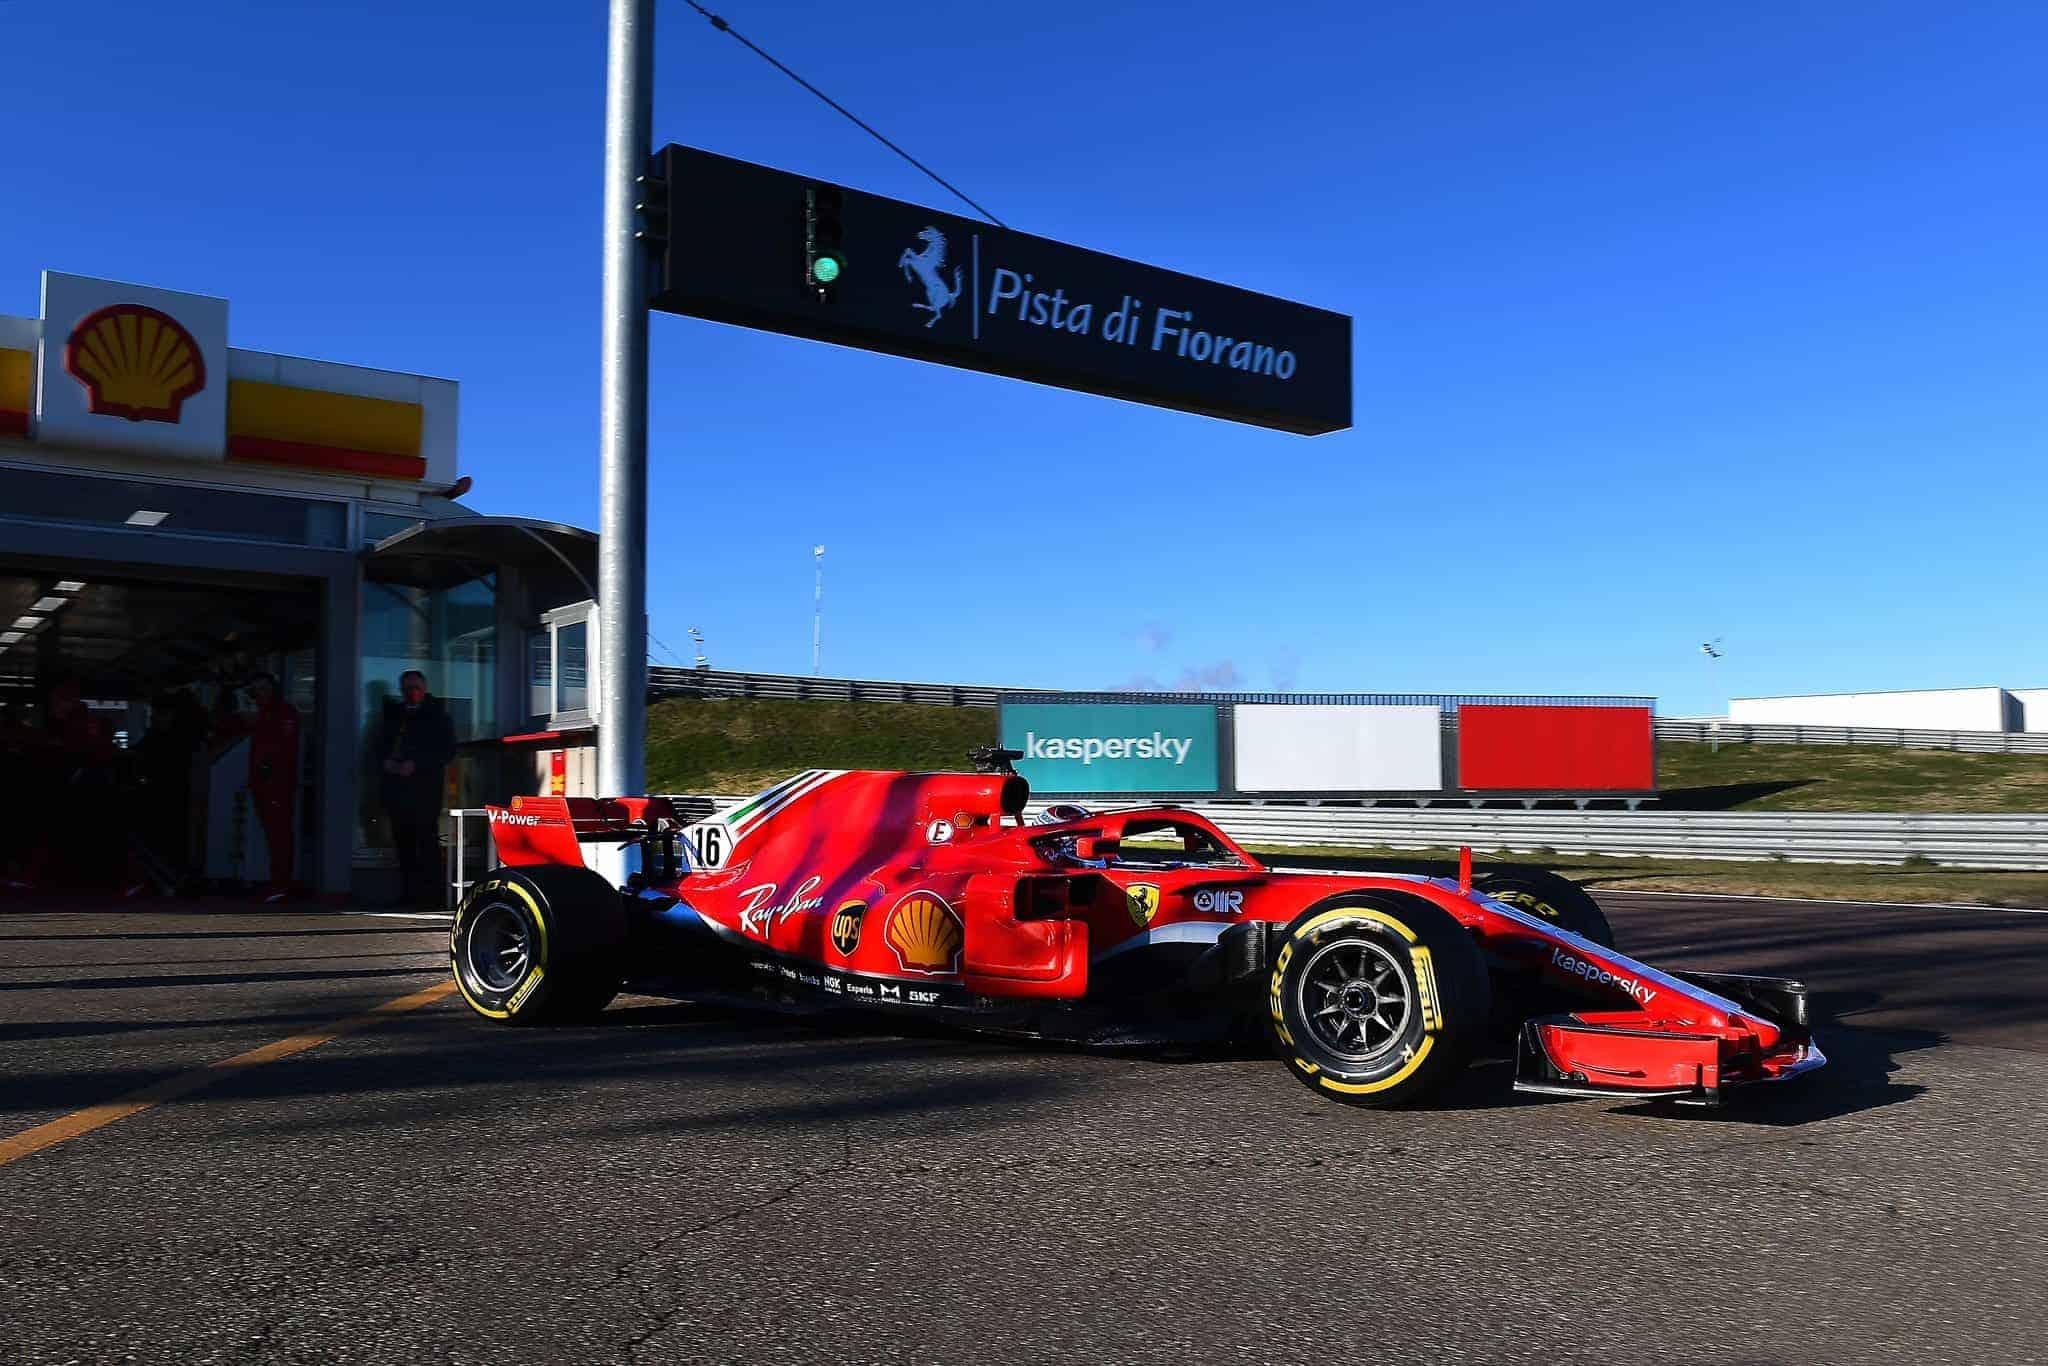 2021 Fiorano F1 test Charles Leclerc SF71H F1 2018 test 26 January 2021 Photo Ferrari